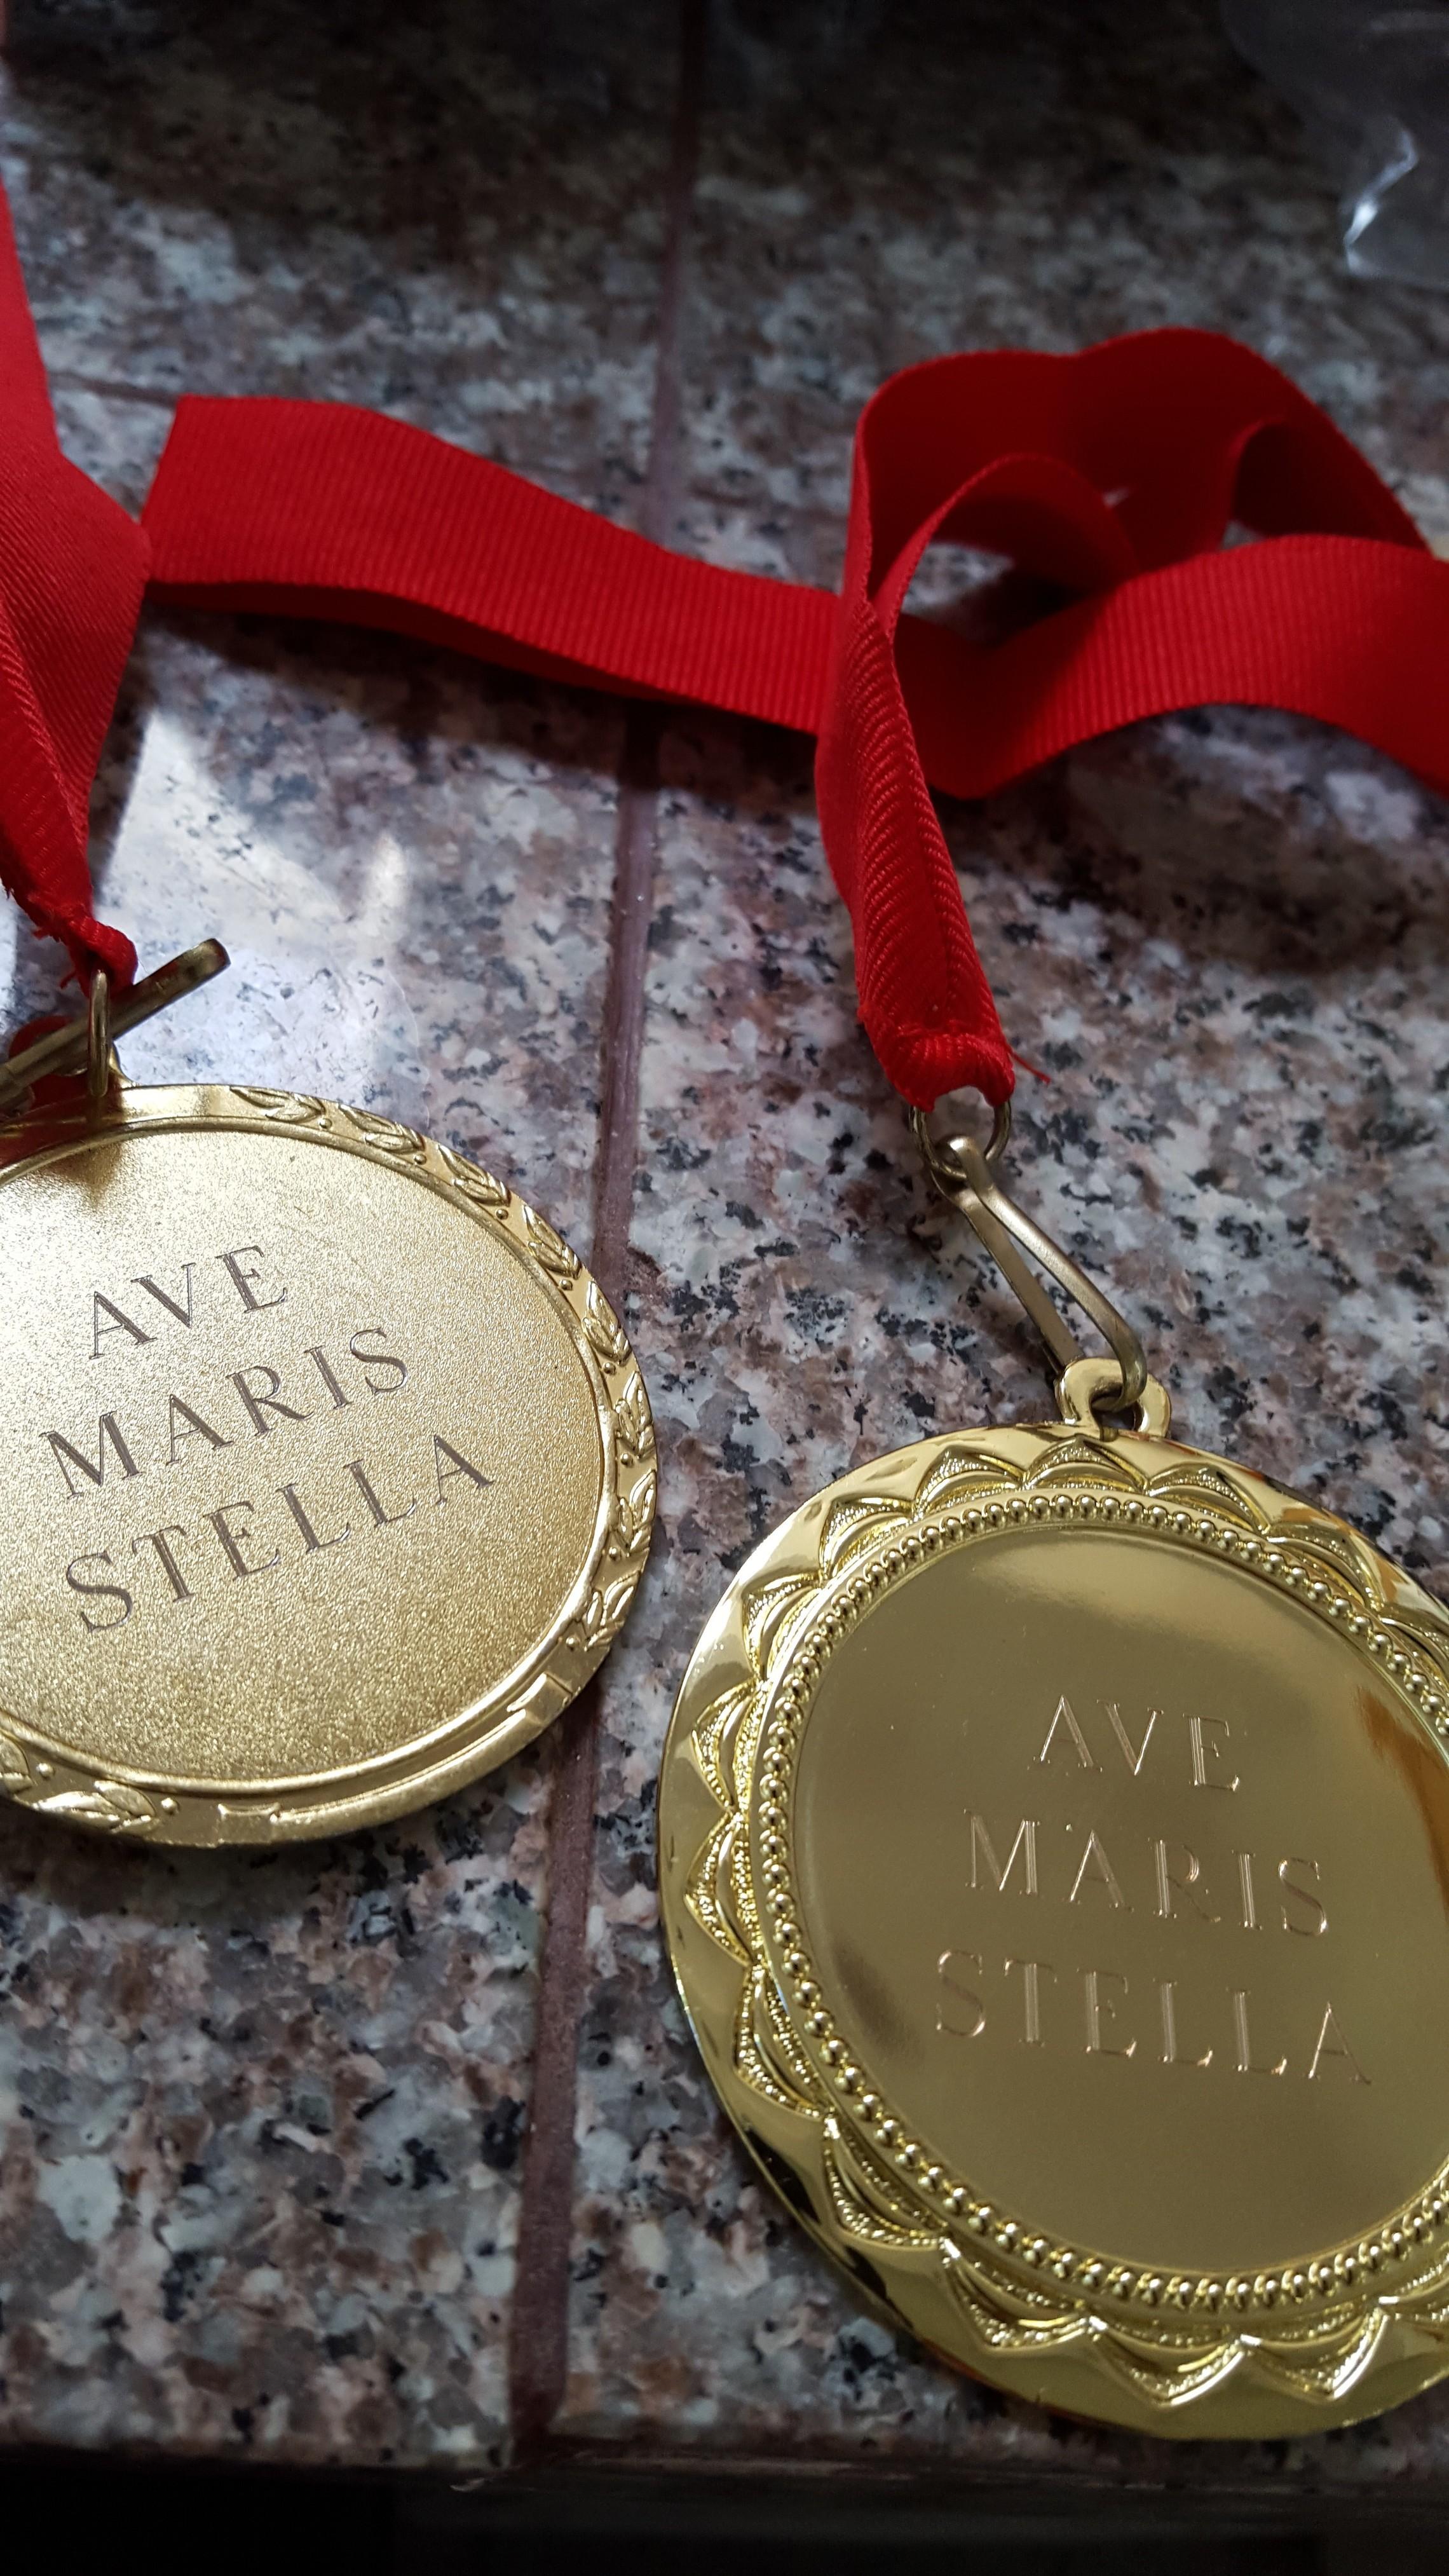 MSI Medal